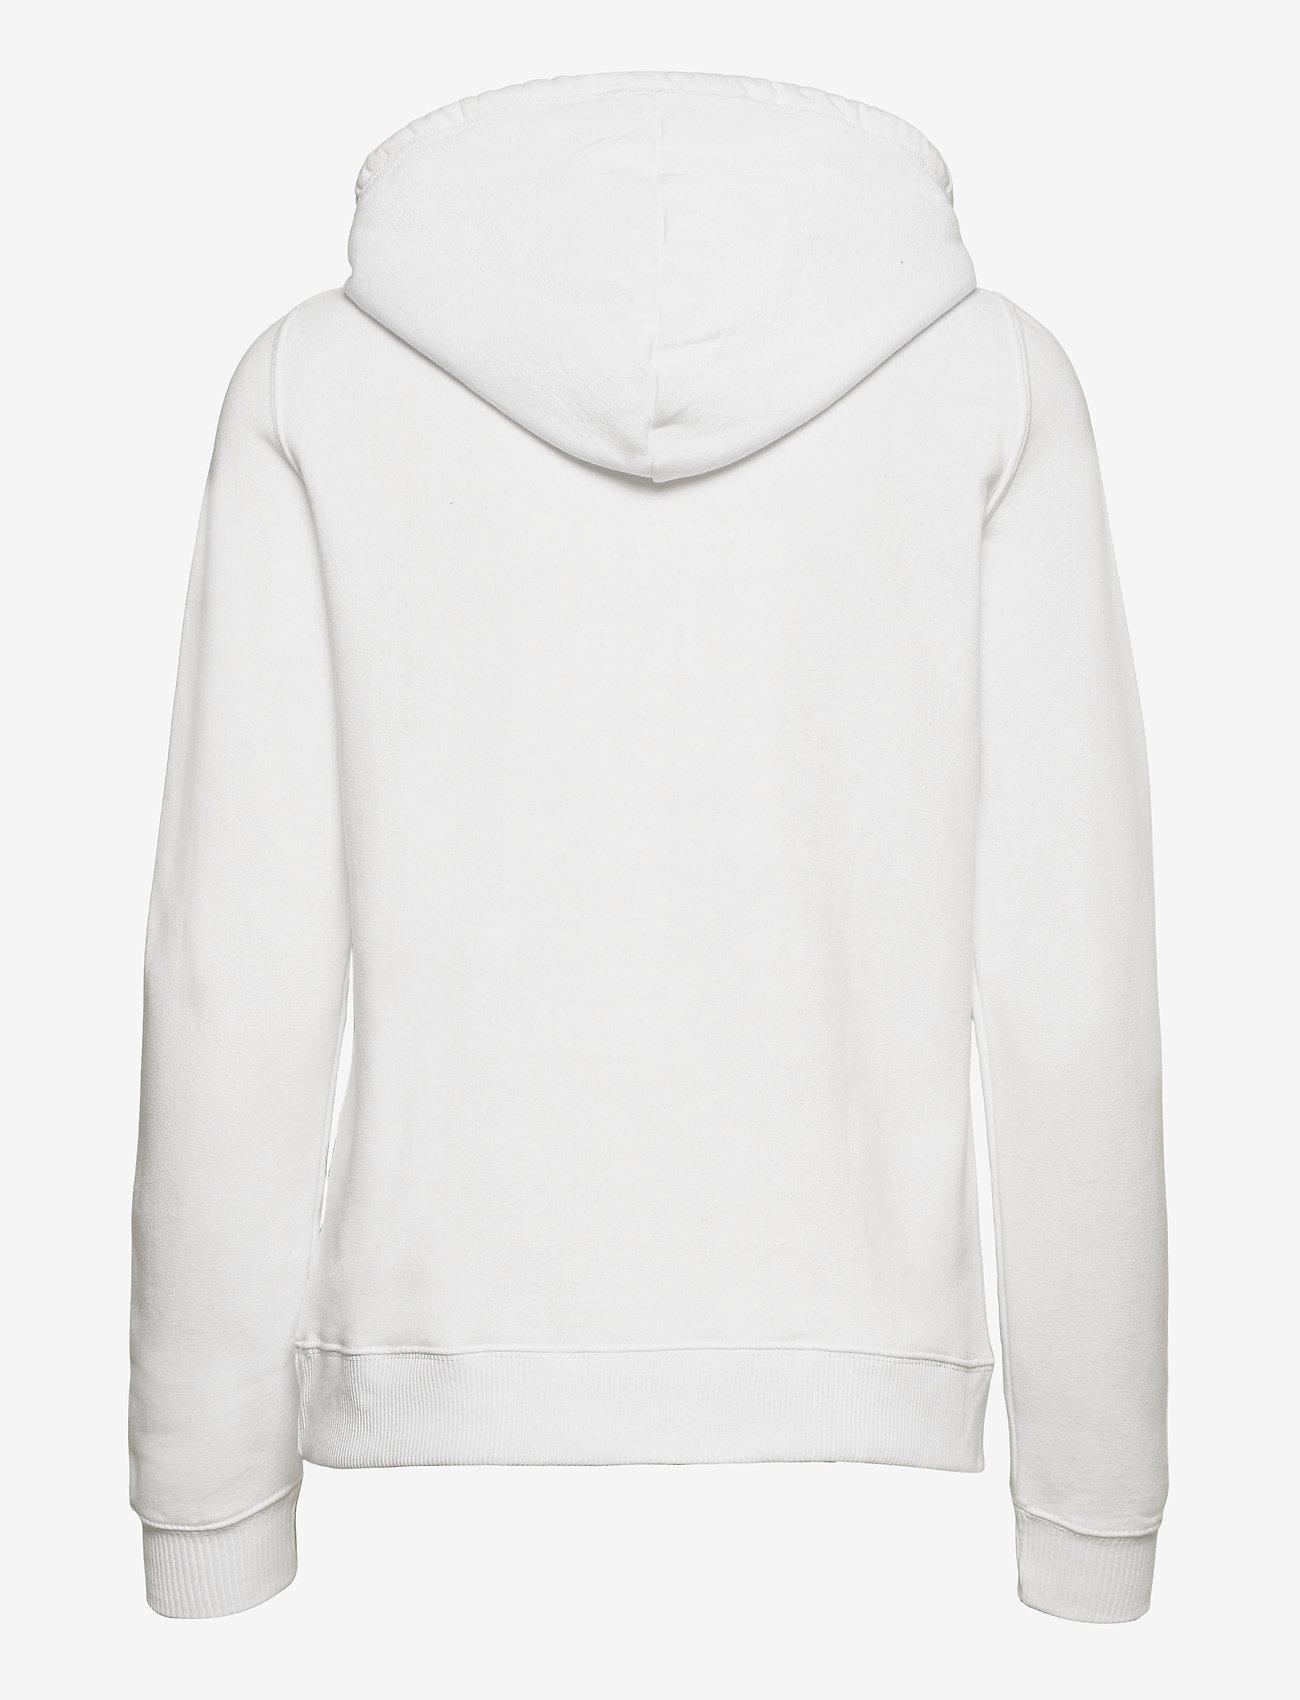 Hollister - HCo. GIRLS SWEATSHIRTS - hættetrøjer - white - 1